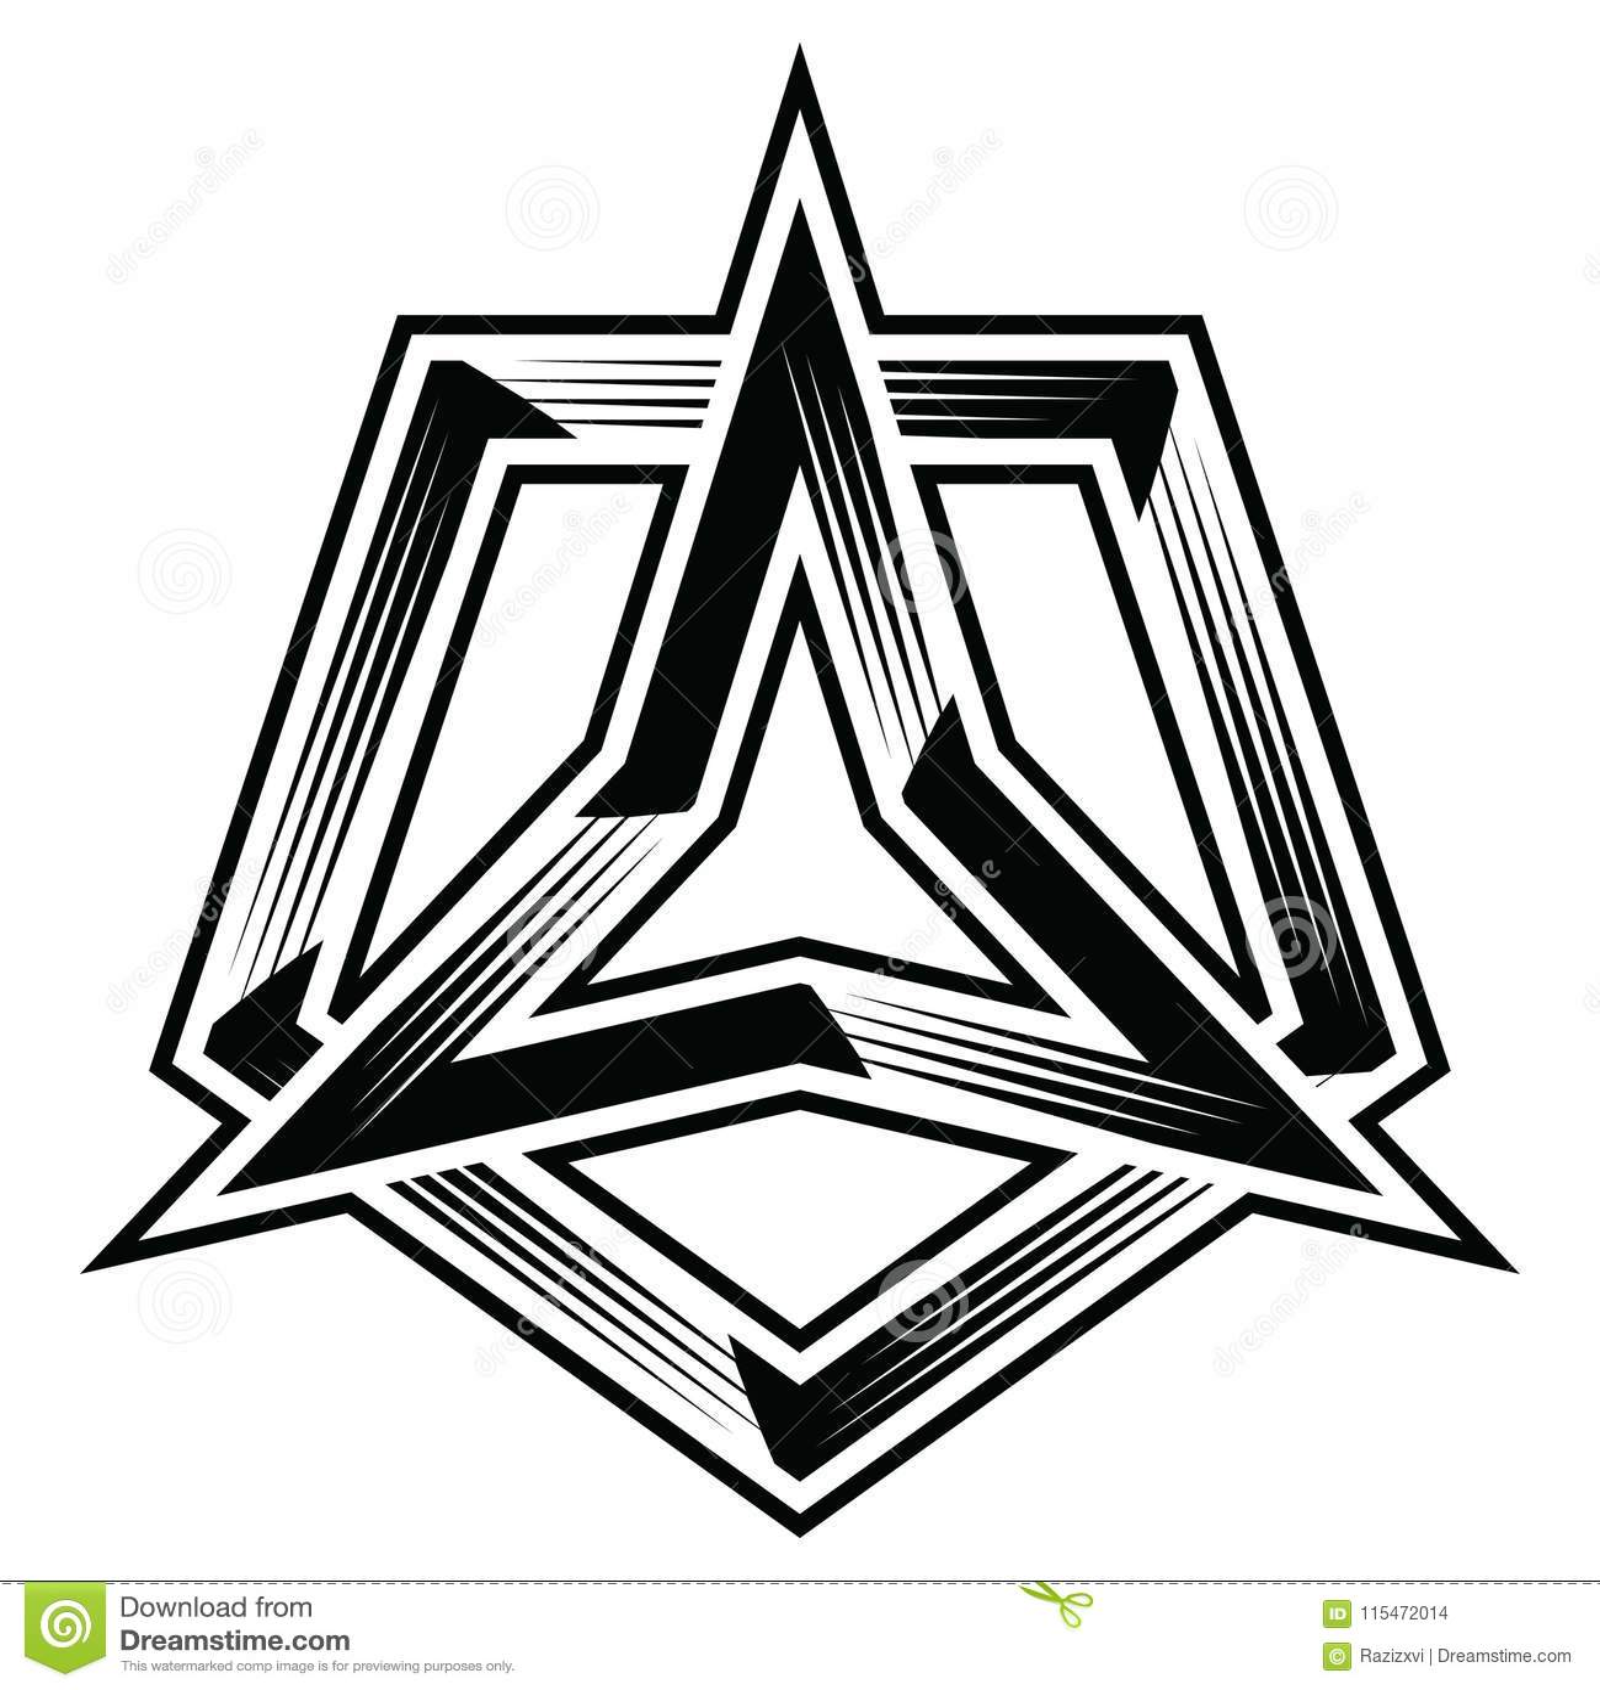 hight resolution of 3points star three corner angle point triangle polygon trilogy trinity trefoil pentagon polygon 5points trio tri five flat logo icon badge banner sticker